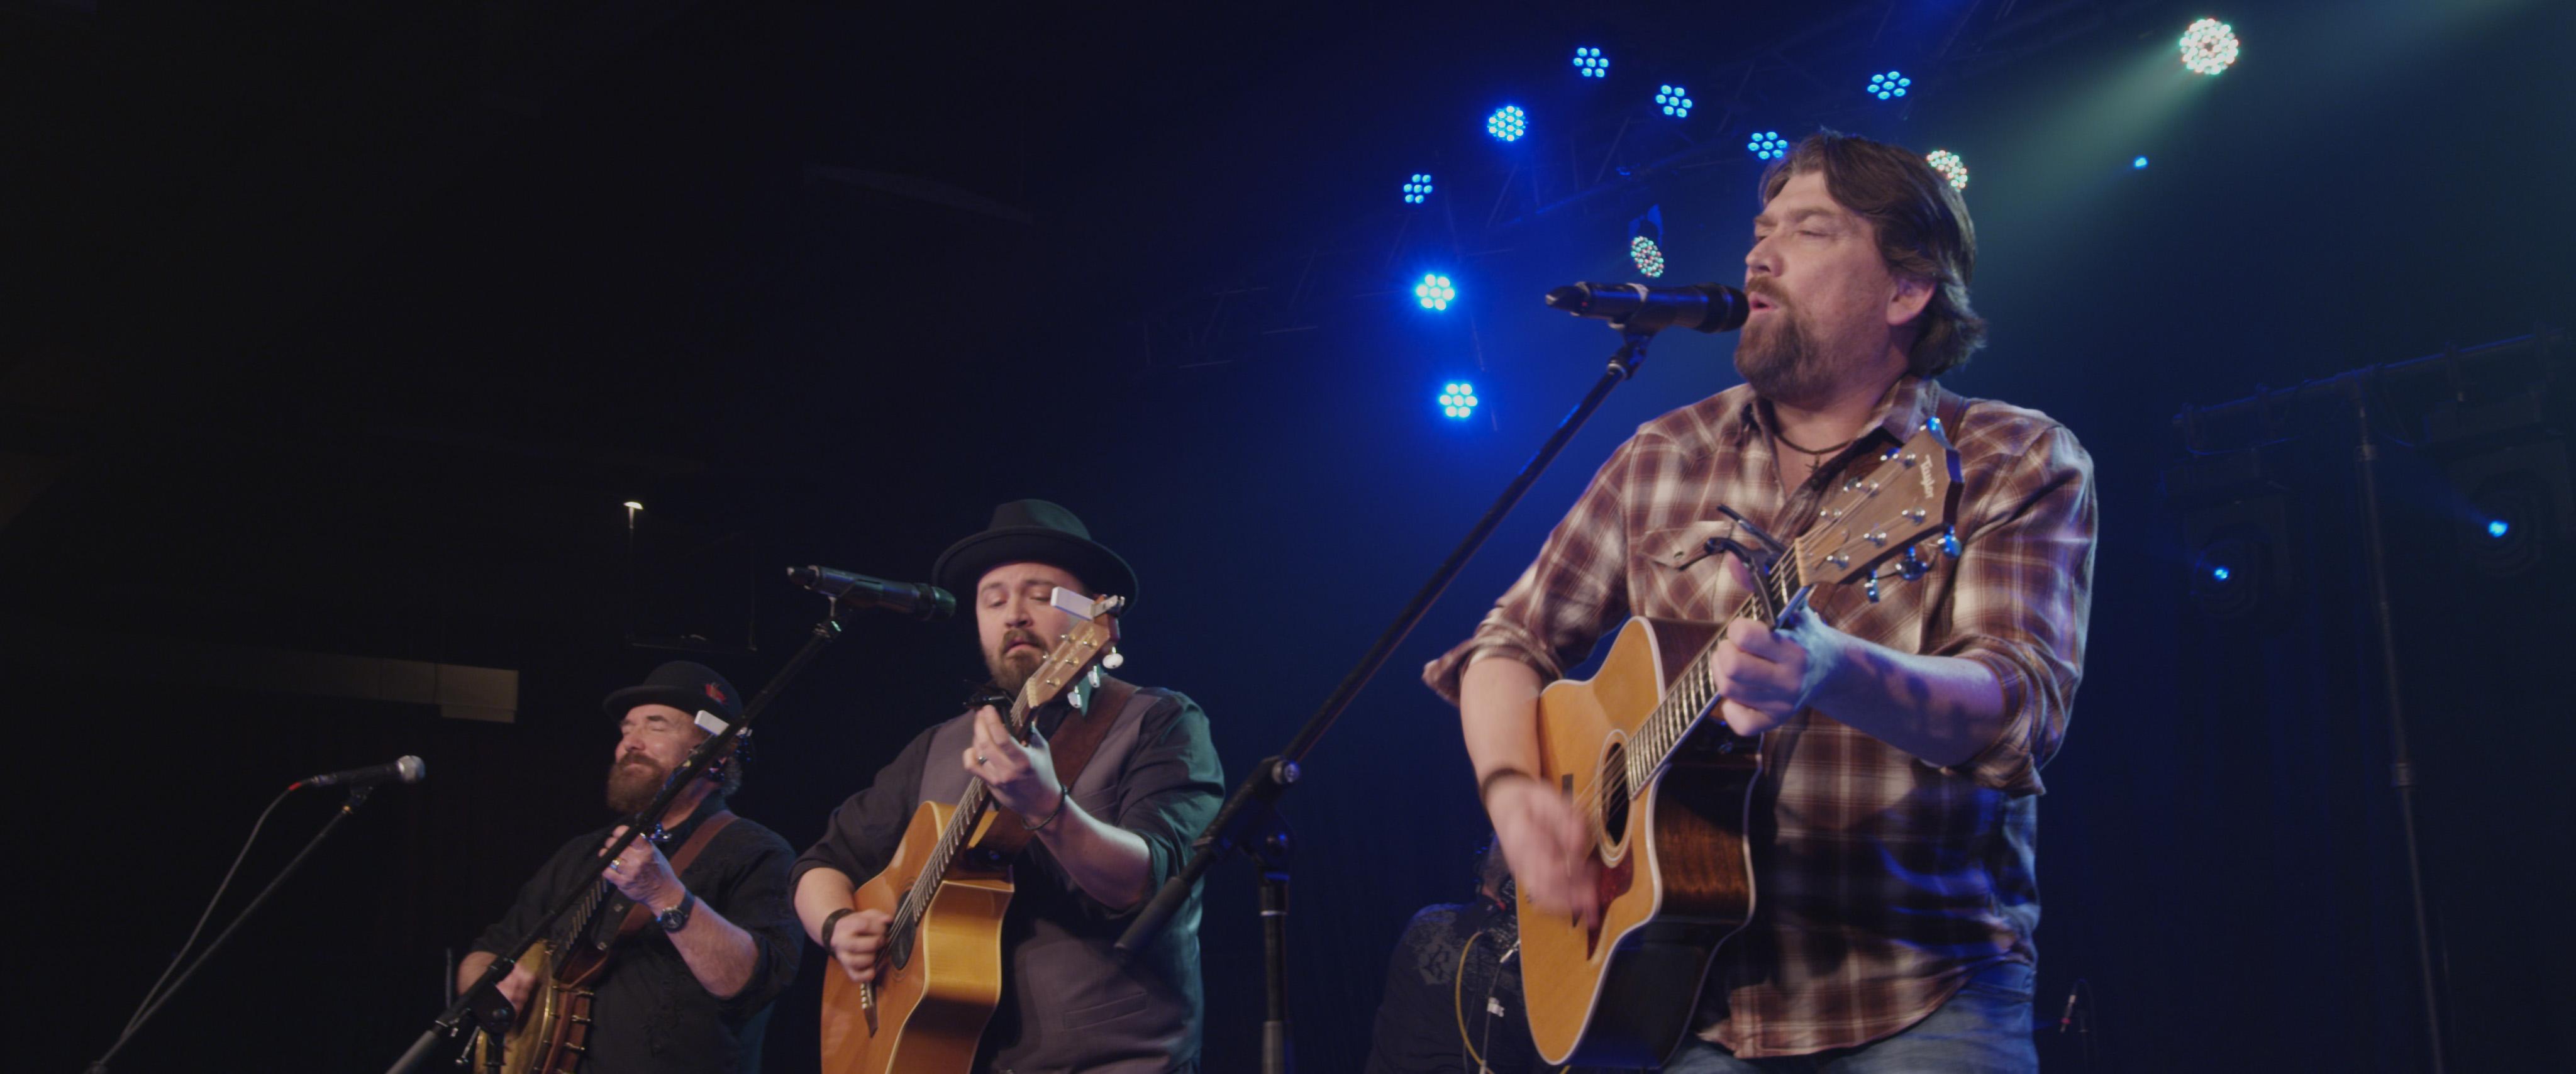 Blake Reid Band - 2017 ACMA's 26